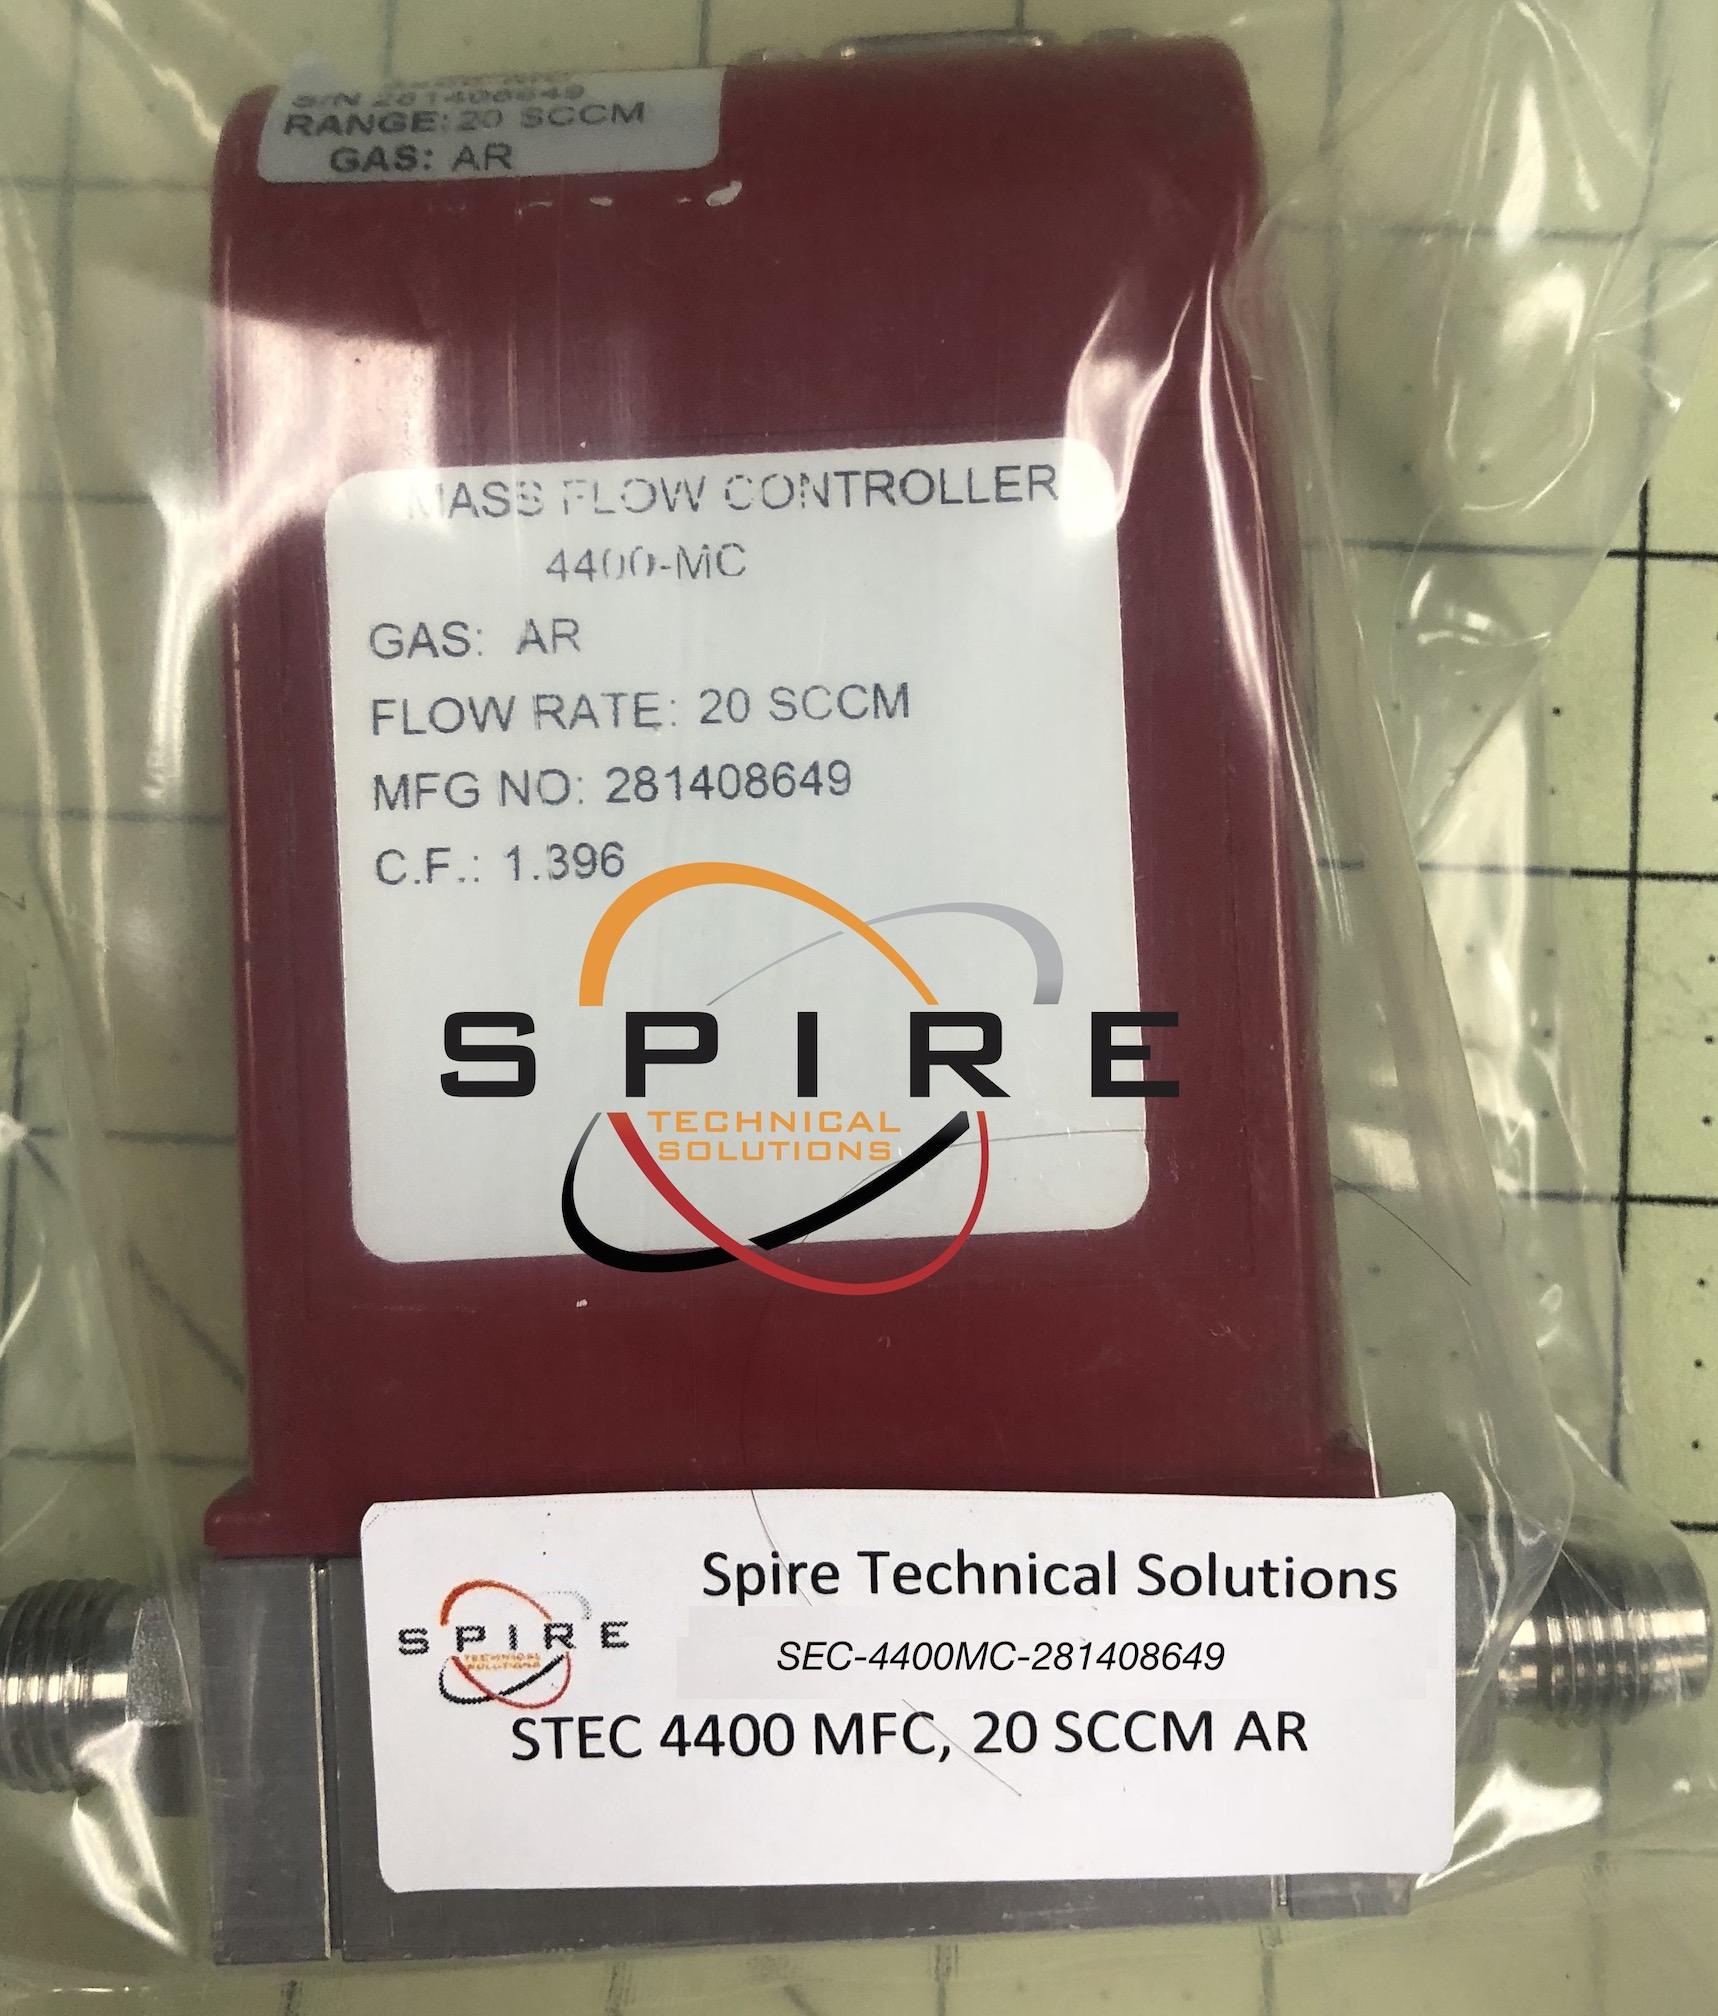 STEC 4400 MFC, 20 SCCM AR